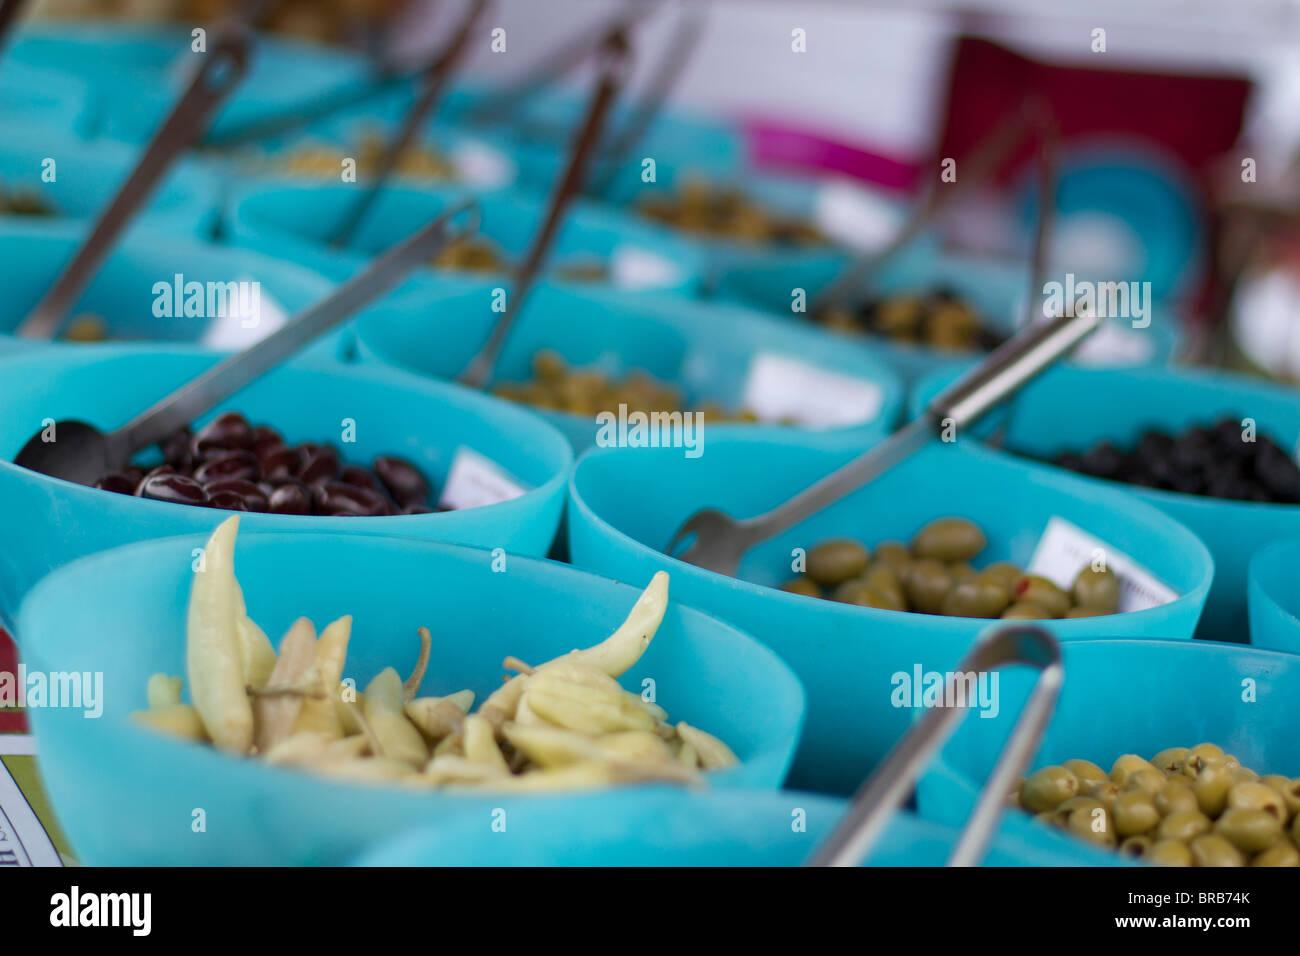 Bowls of Olives - Stock Image